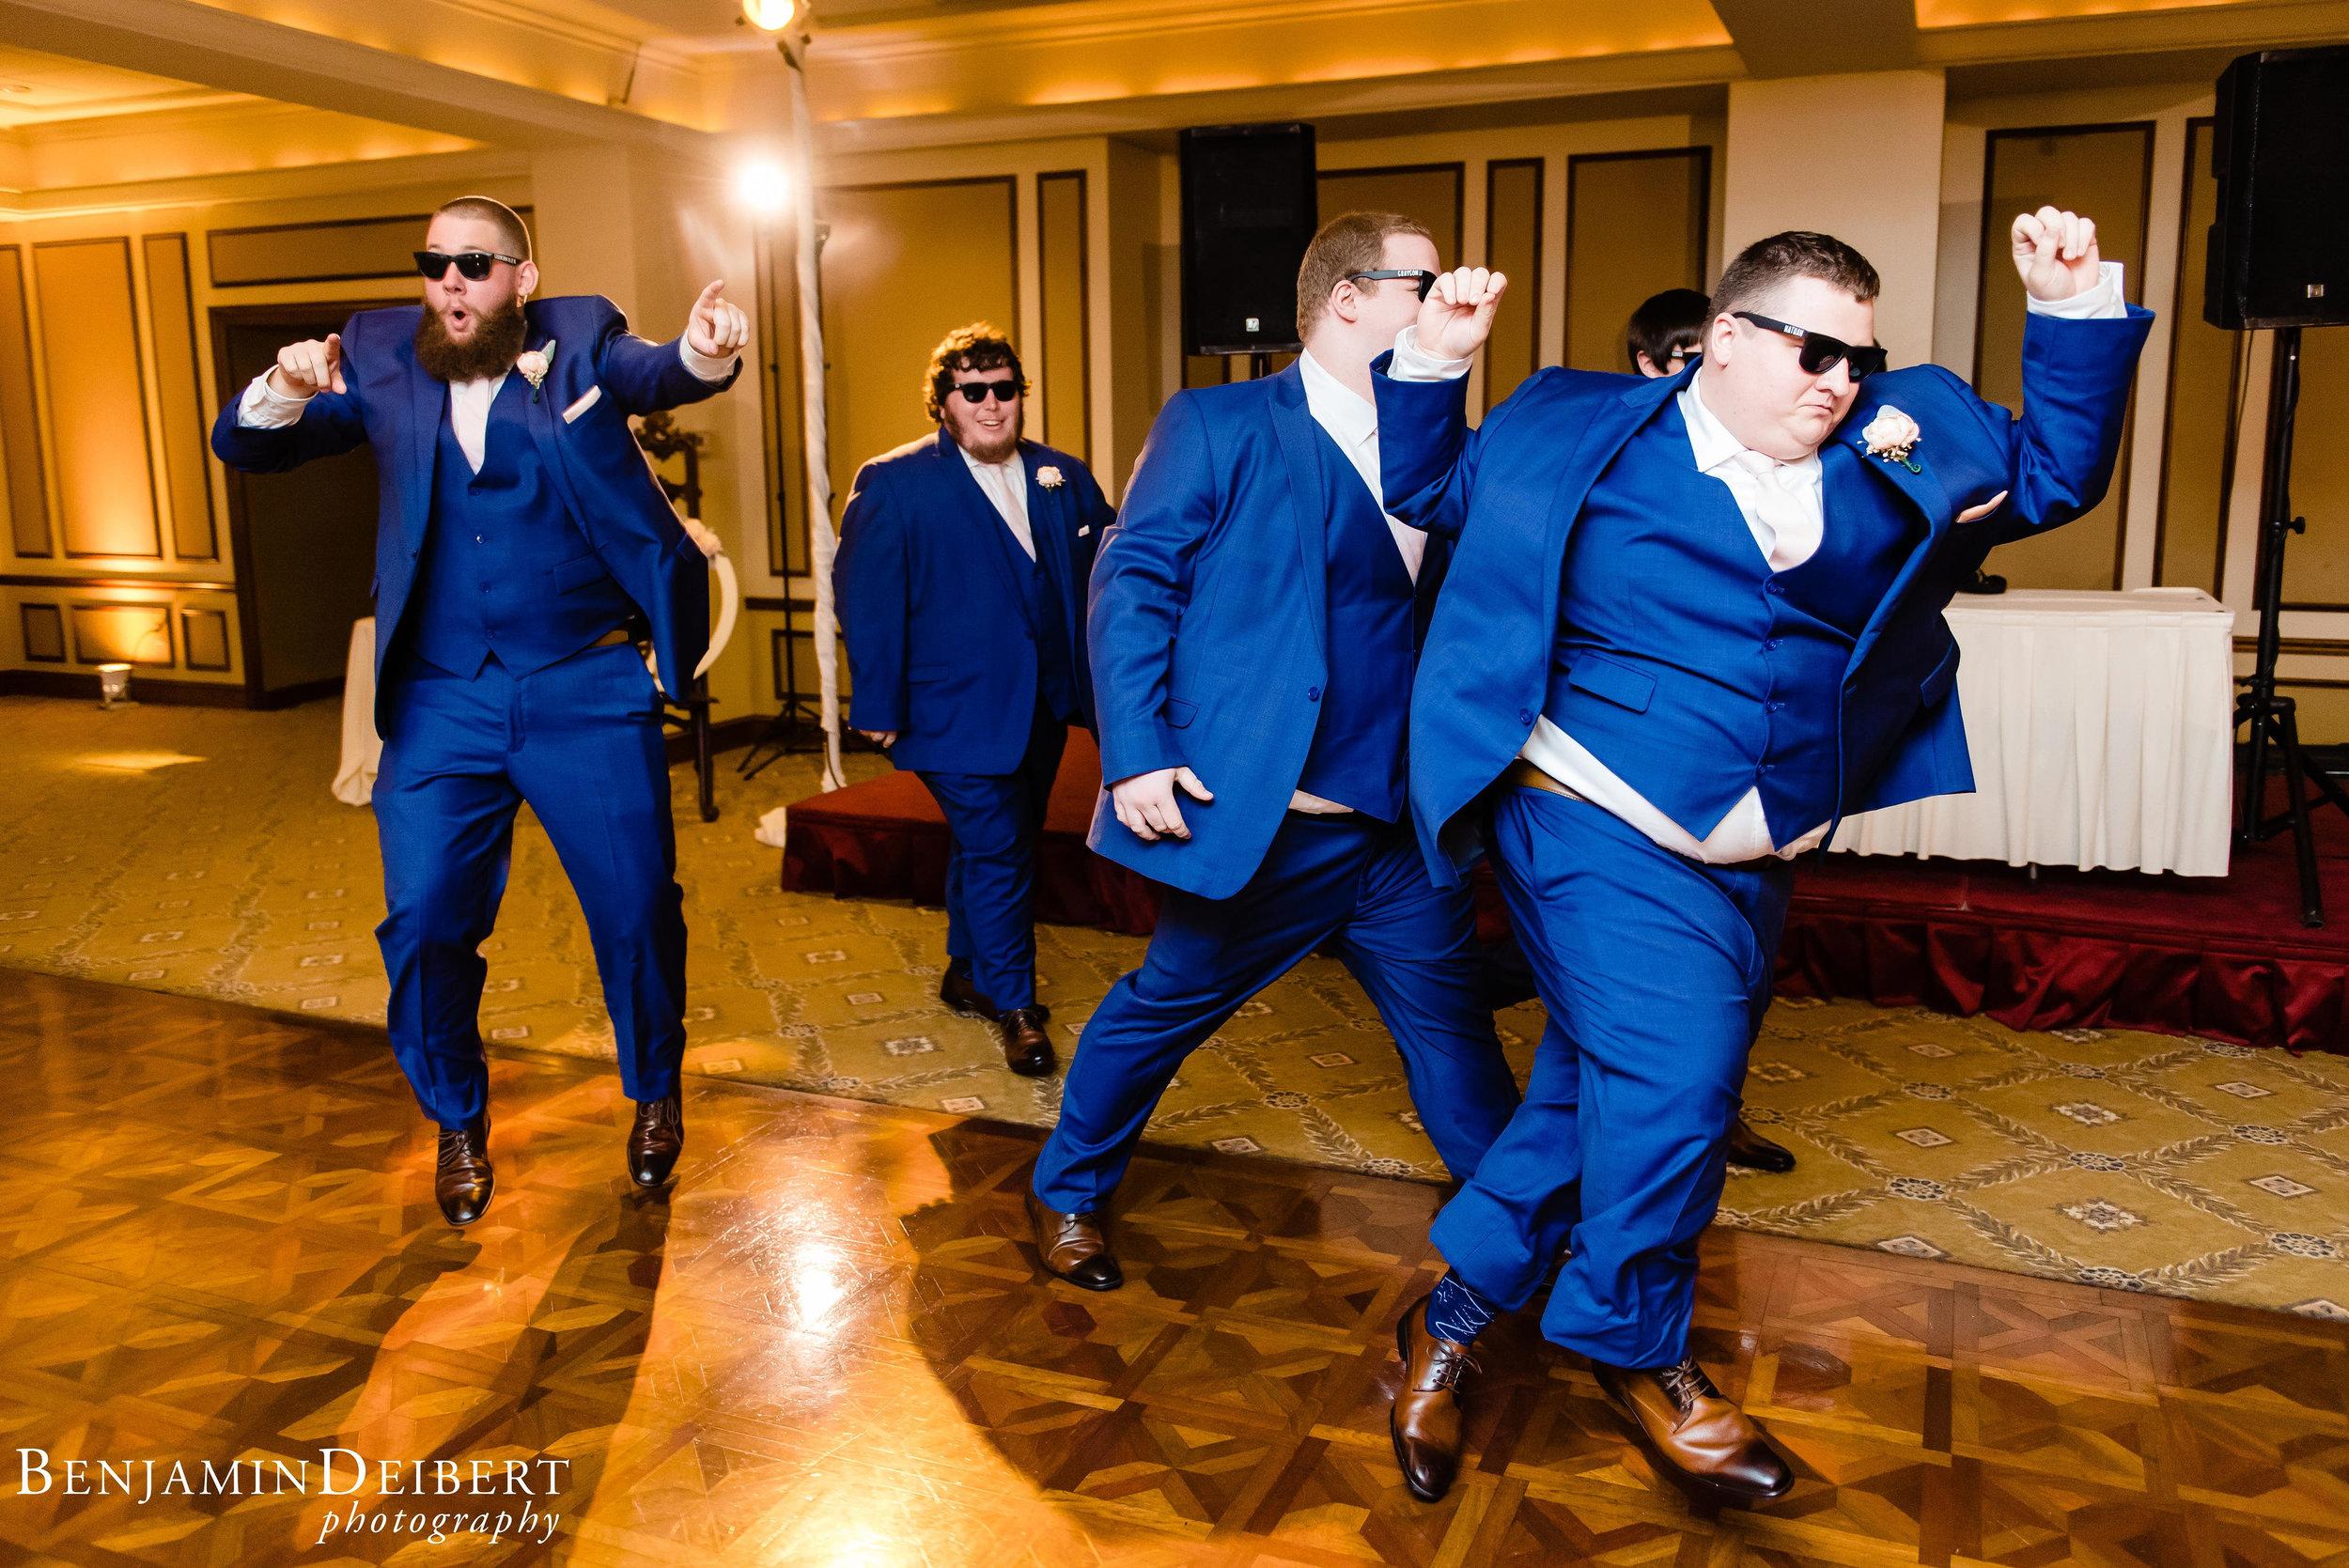 AshleyandDerrick_RadnorValleyCountryClub_Wedding-53.jpg